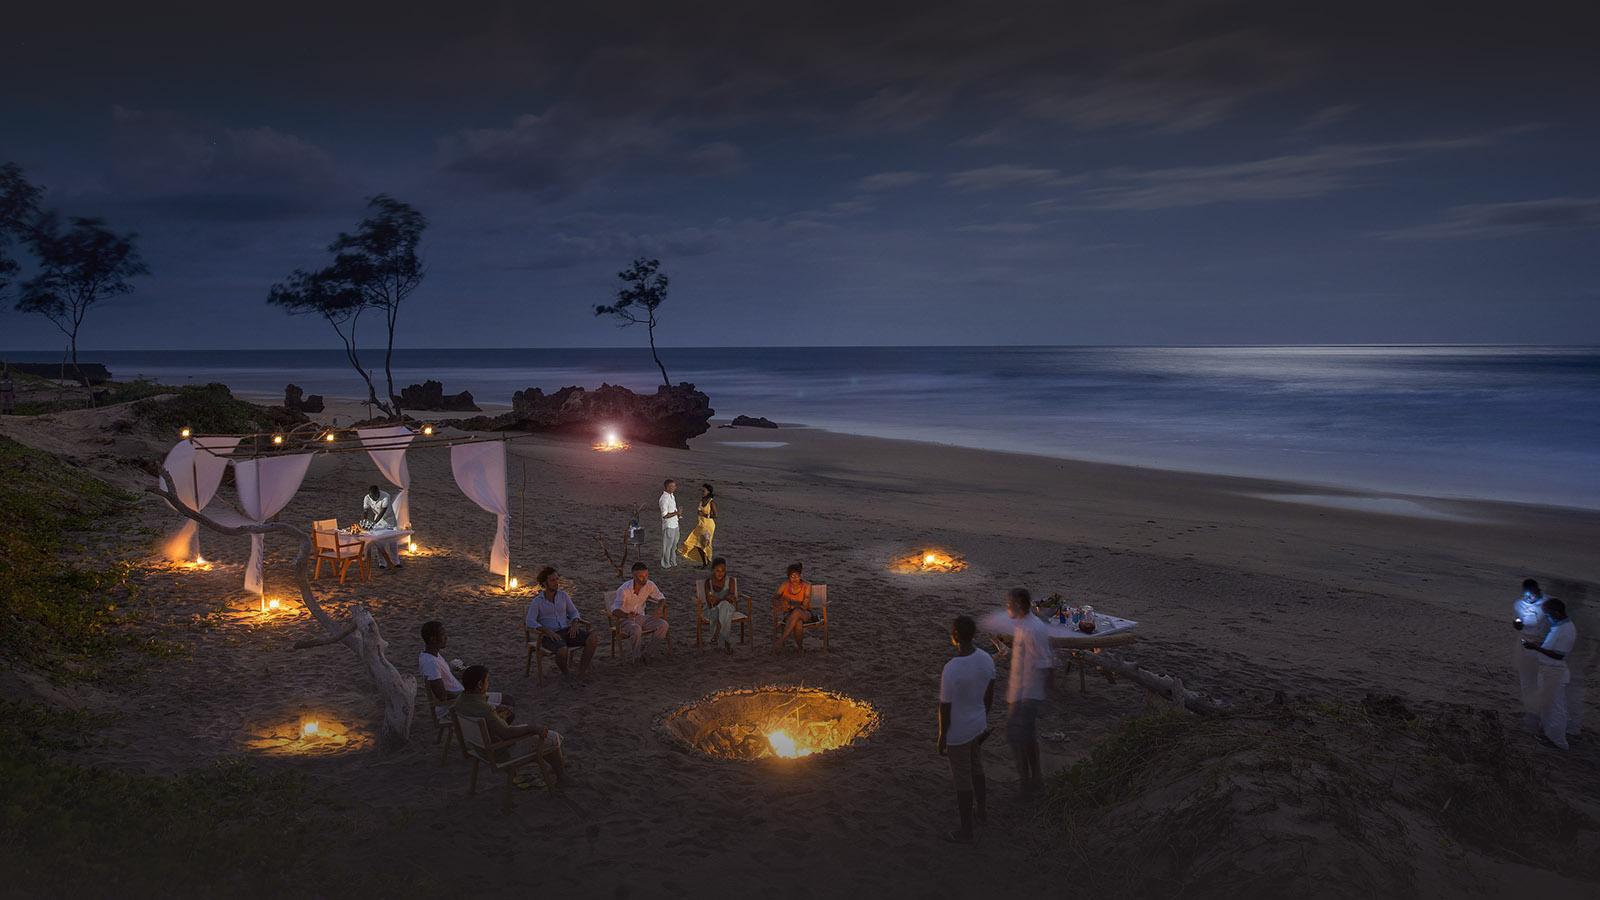 diamonds mequfi beach resort mozambique-lodges-pemba-zambia-in-style-paradise-pristine-beach-camp-fire